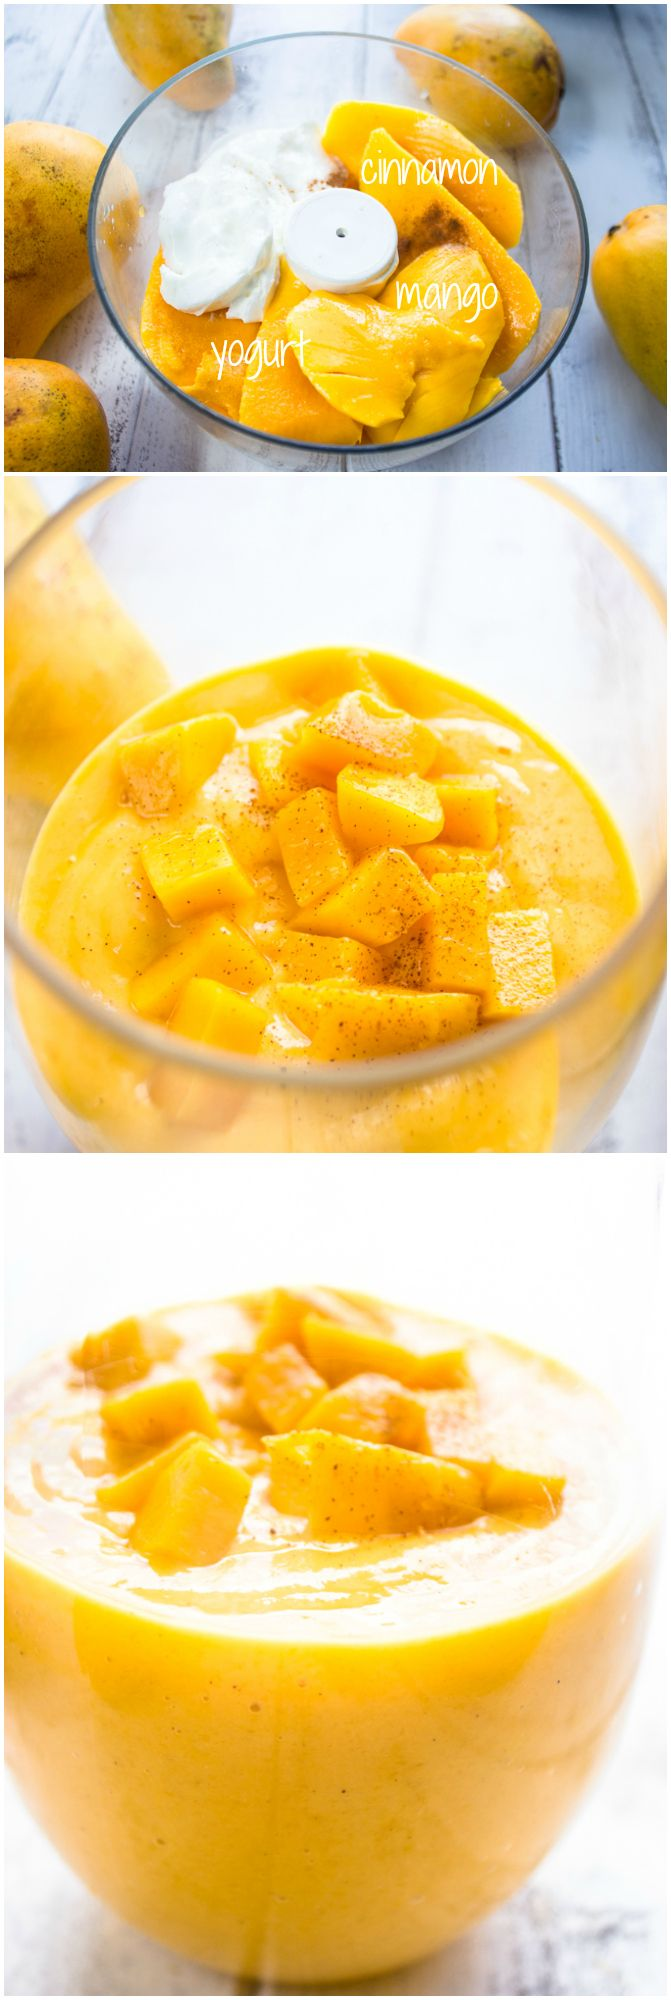 Healthy Mango and Greek Yogurt Smoothie {3 Ingredients} by brunchtimebaker #Smoothie #Mango #Yogurt #Cinnamon #Healthy #Easy